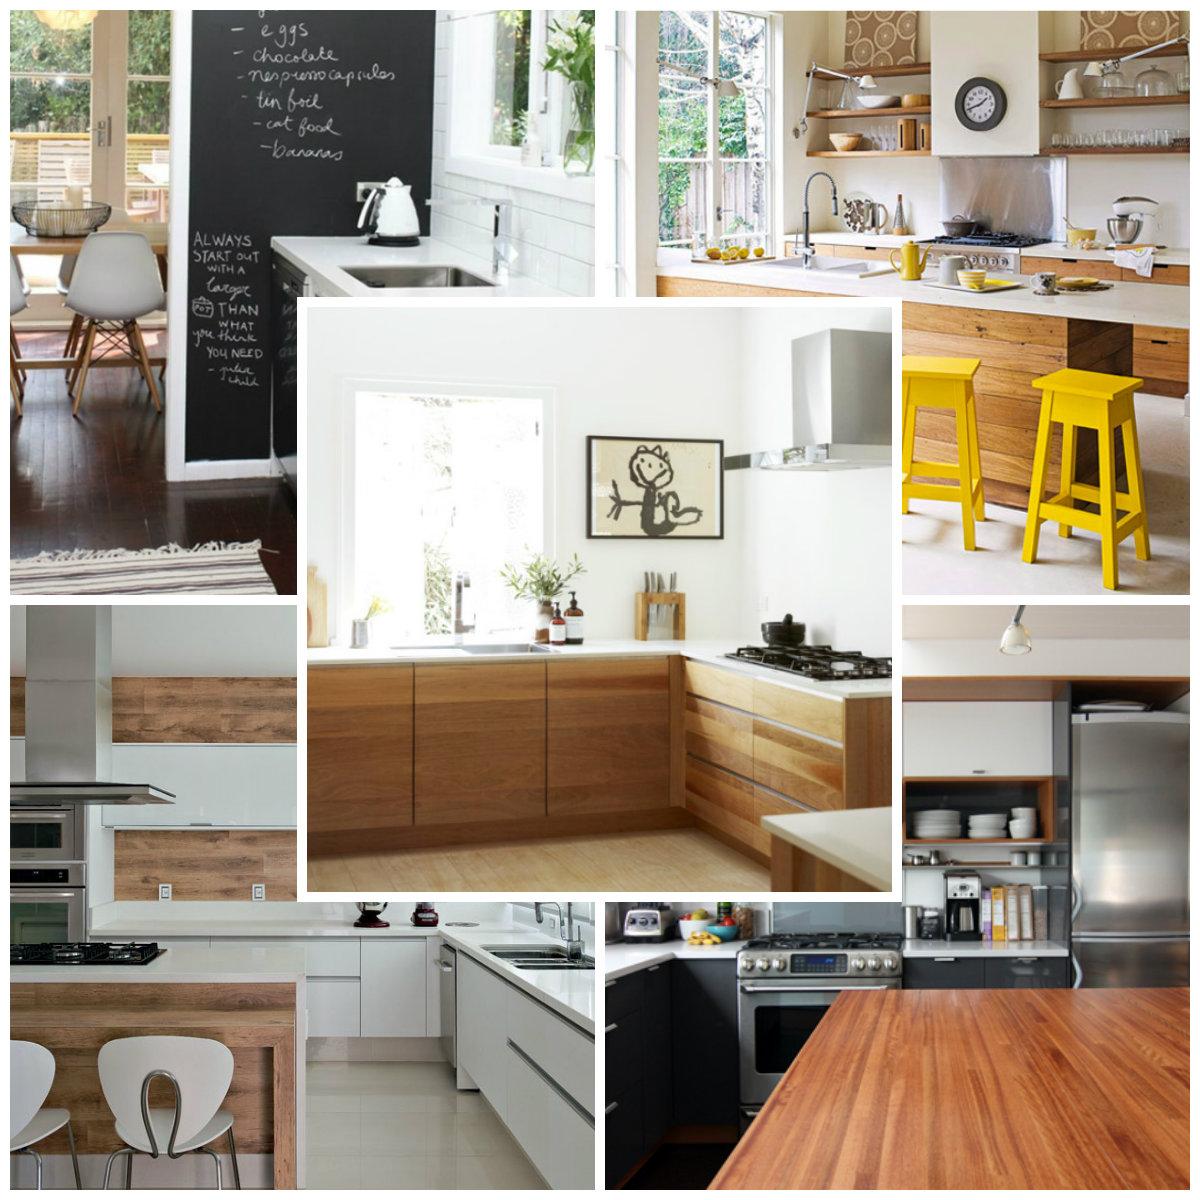 Ikea Kitchen Ideas And Inspiration: Ikea Kitchen Design And Inspiration